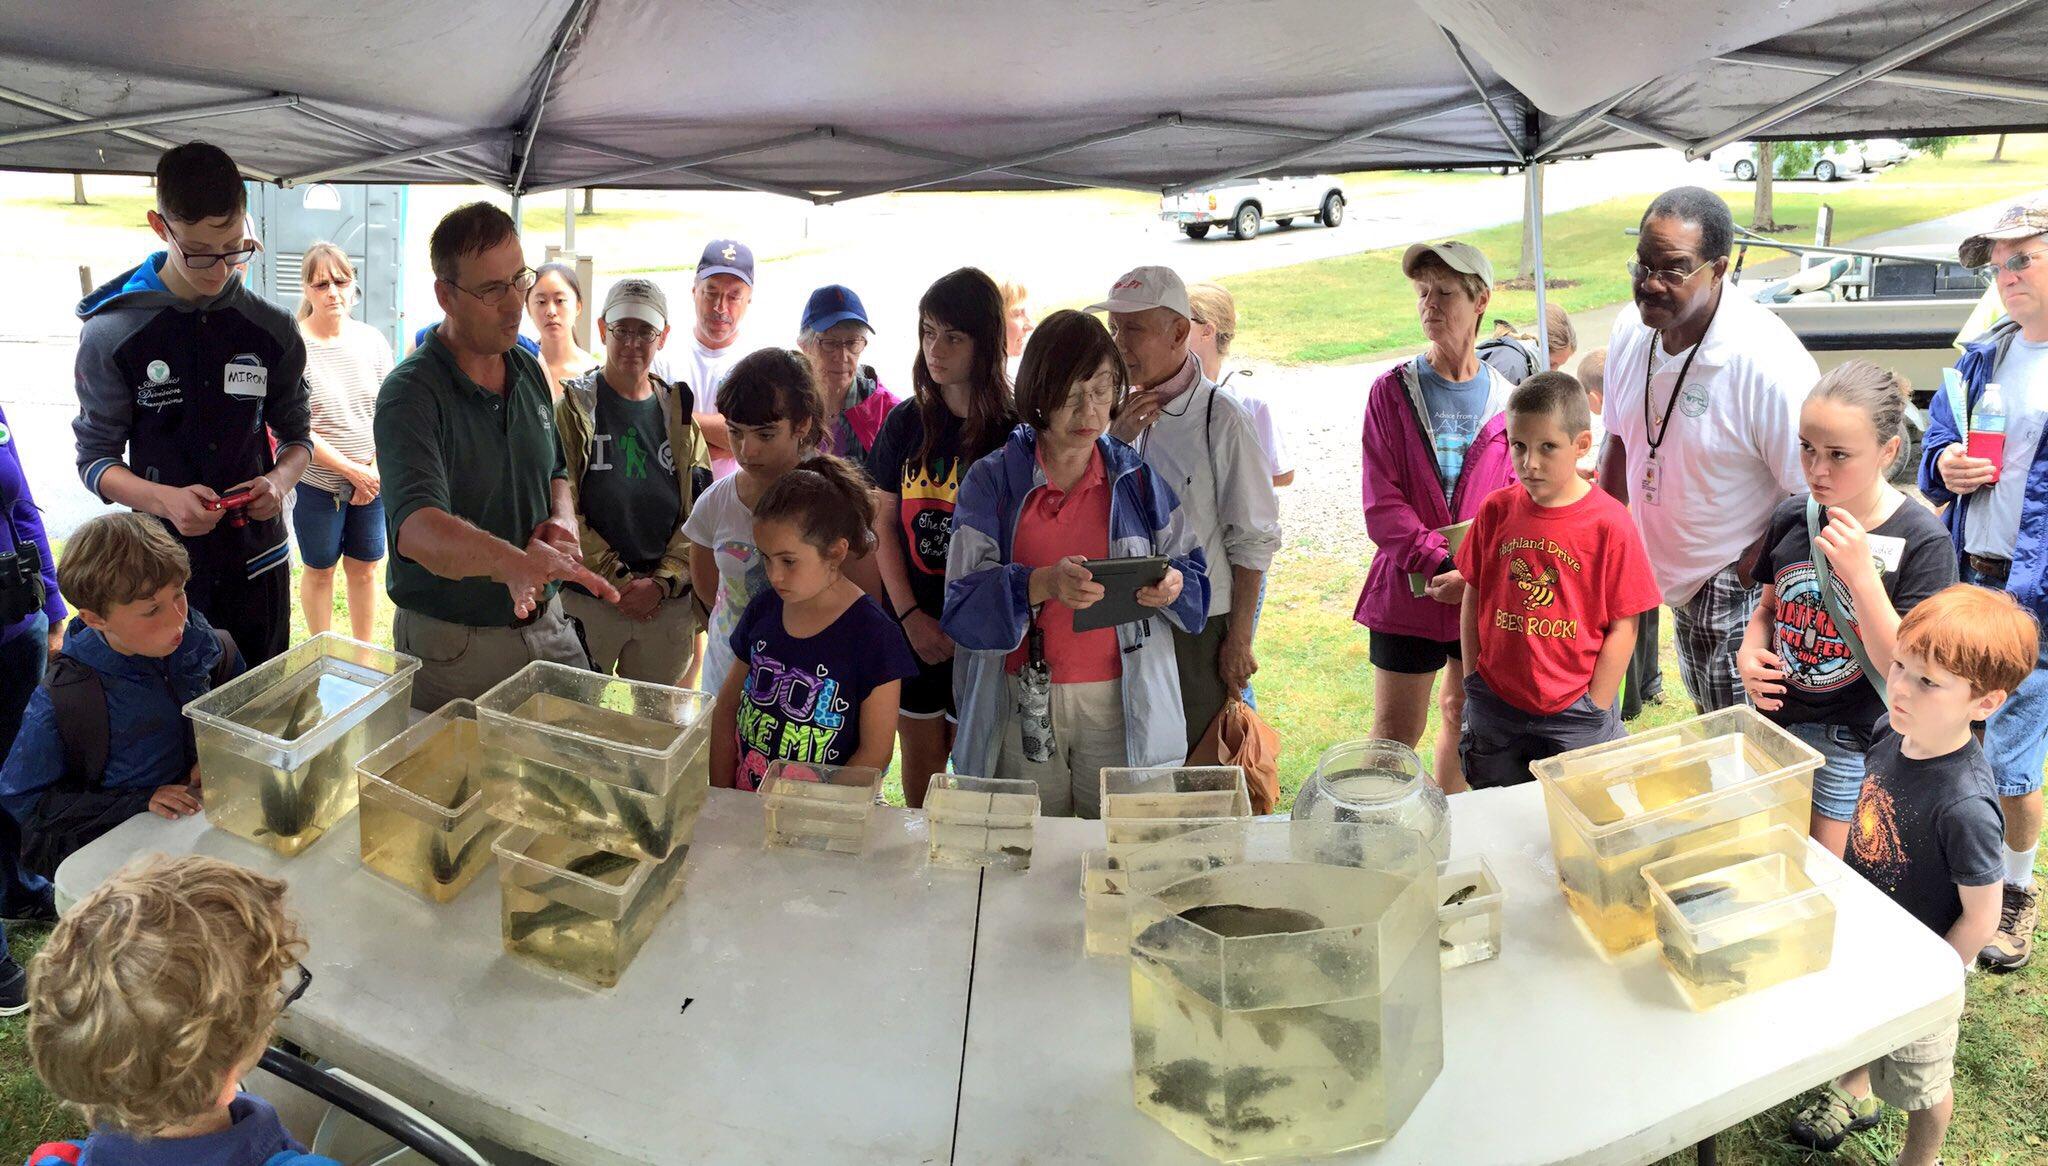 Final stop, Euclid Creek, learning about #electrofishing and taking a wetland restoration tour! #DITLeuclidcreek https://t.co/TNRKYfYKA7